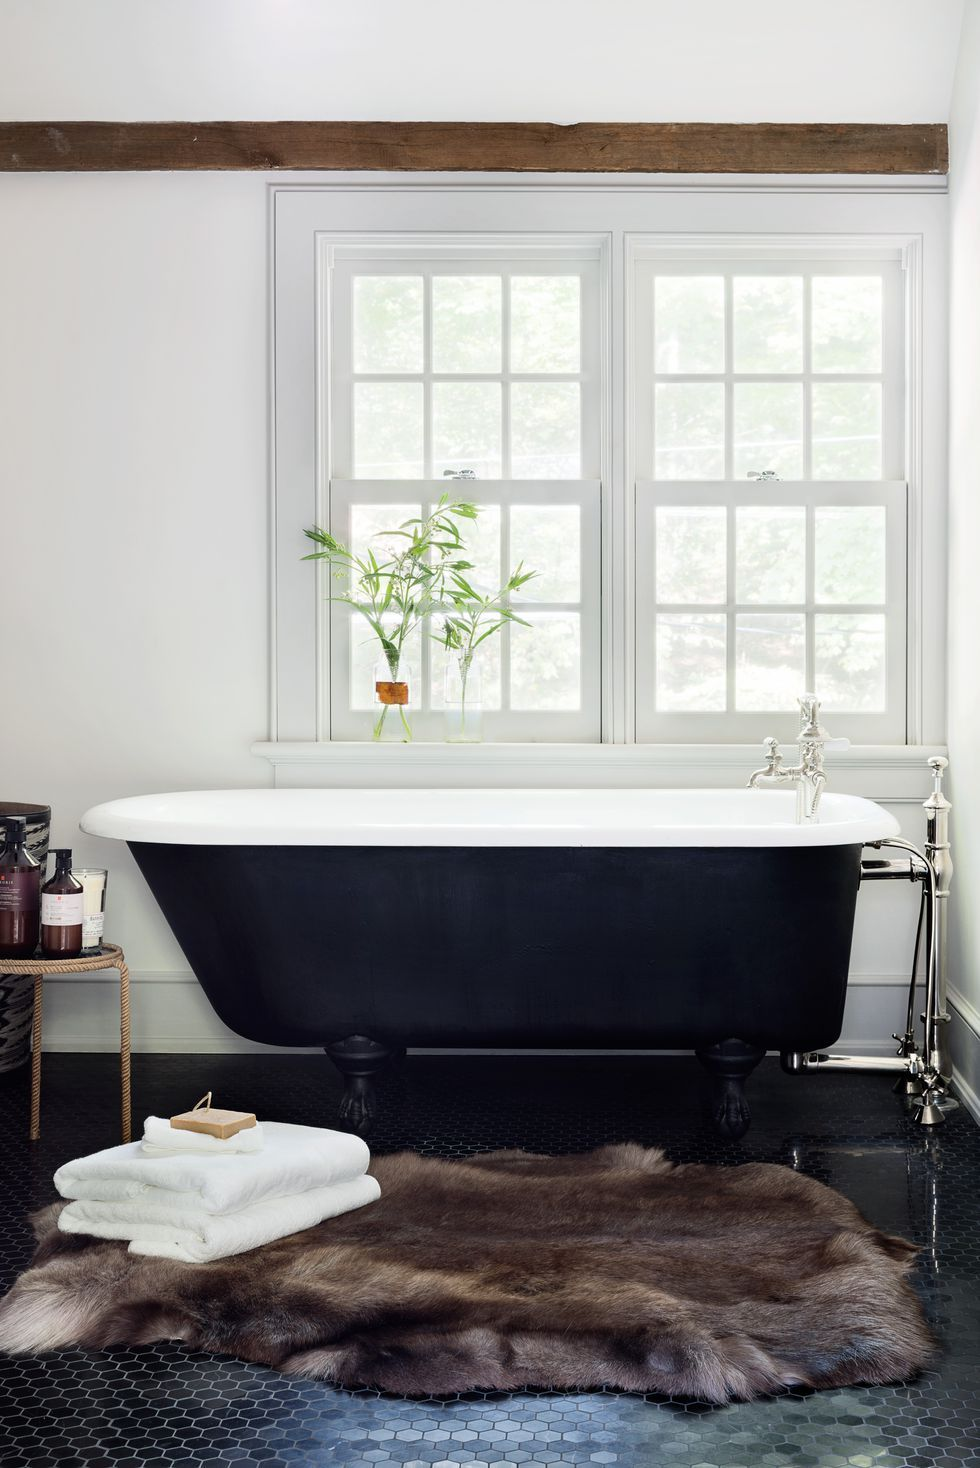 Modern Bathroom Ideas & 25 Best Modern Bathrooms - Luxurious Bathroom Ideas